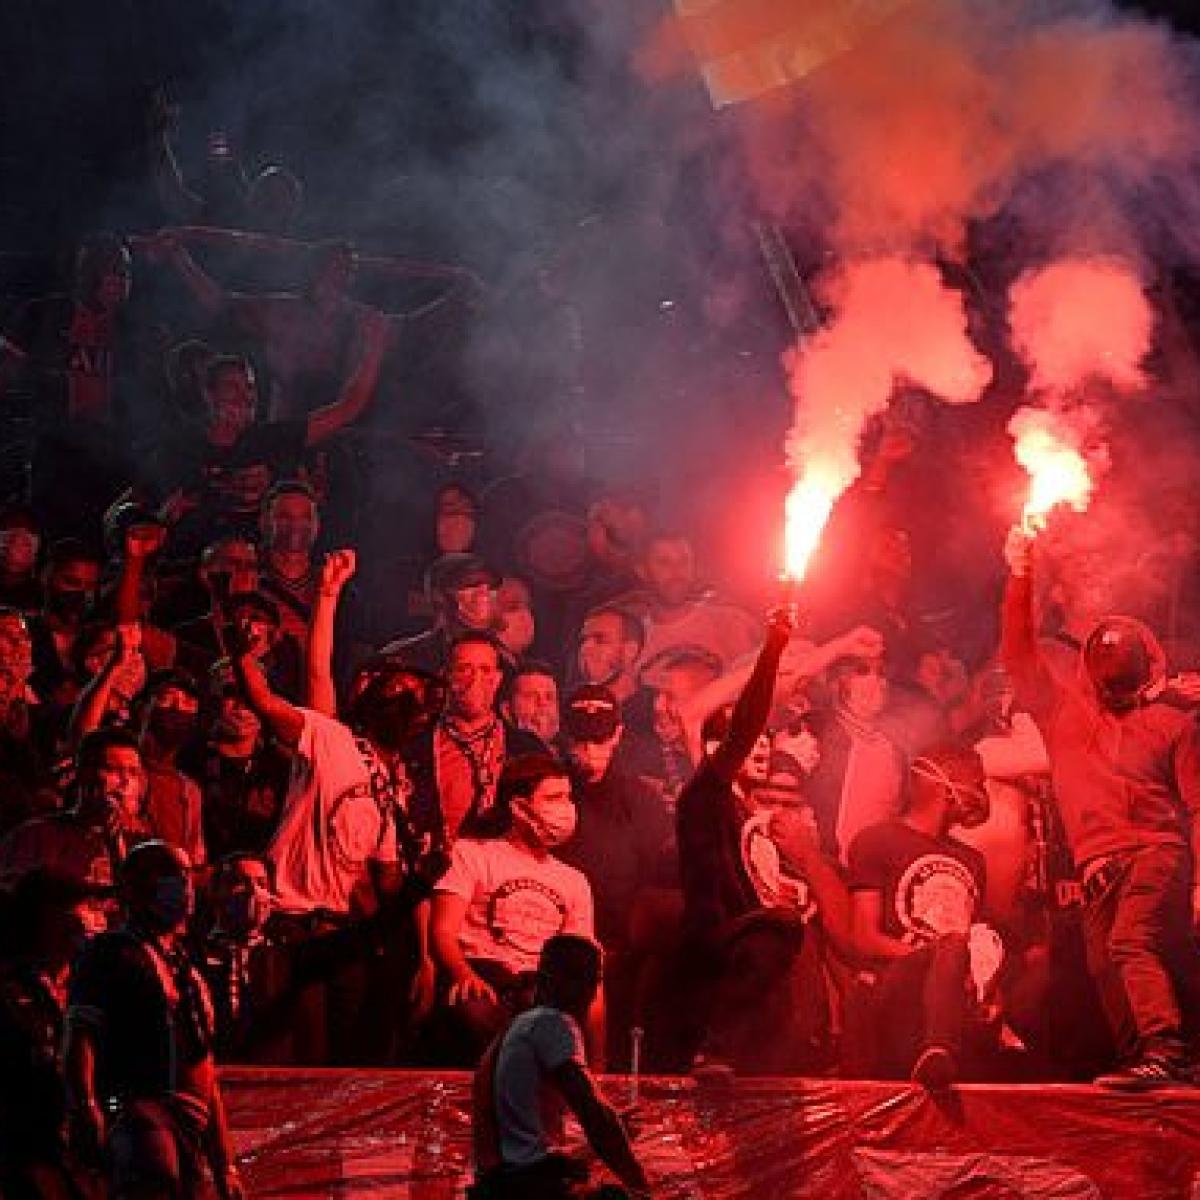 PSG fans clash with Paris riot police after Champions League defeat against Bayern Munich